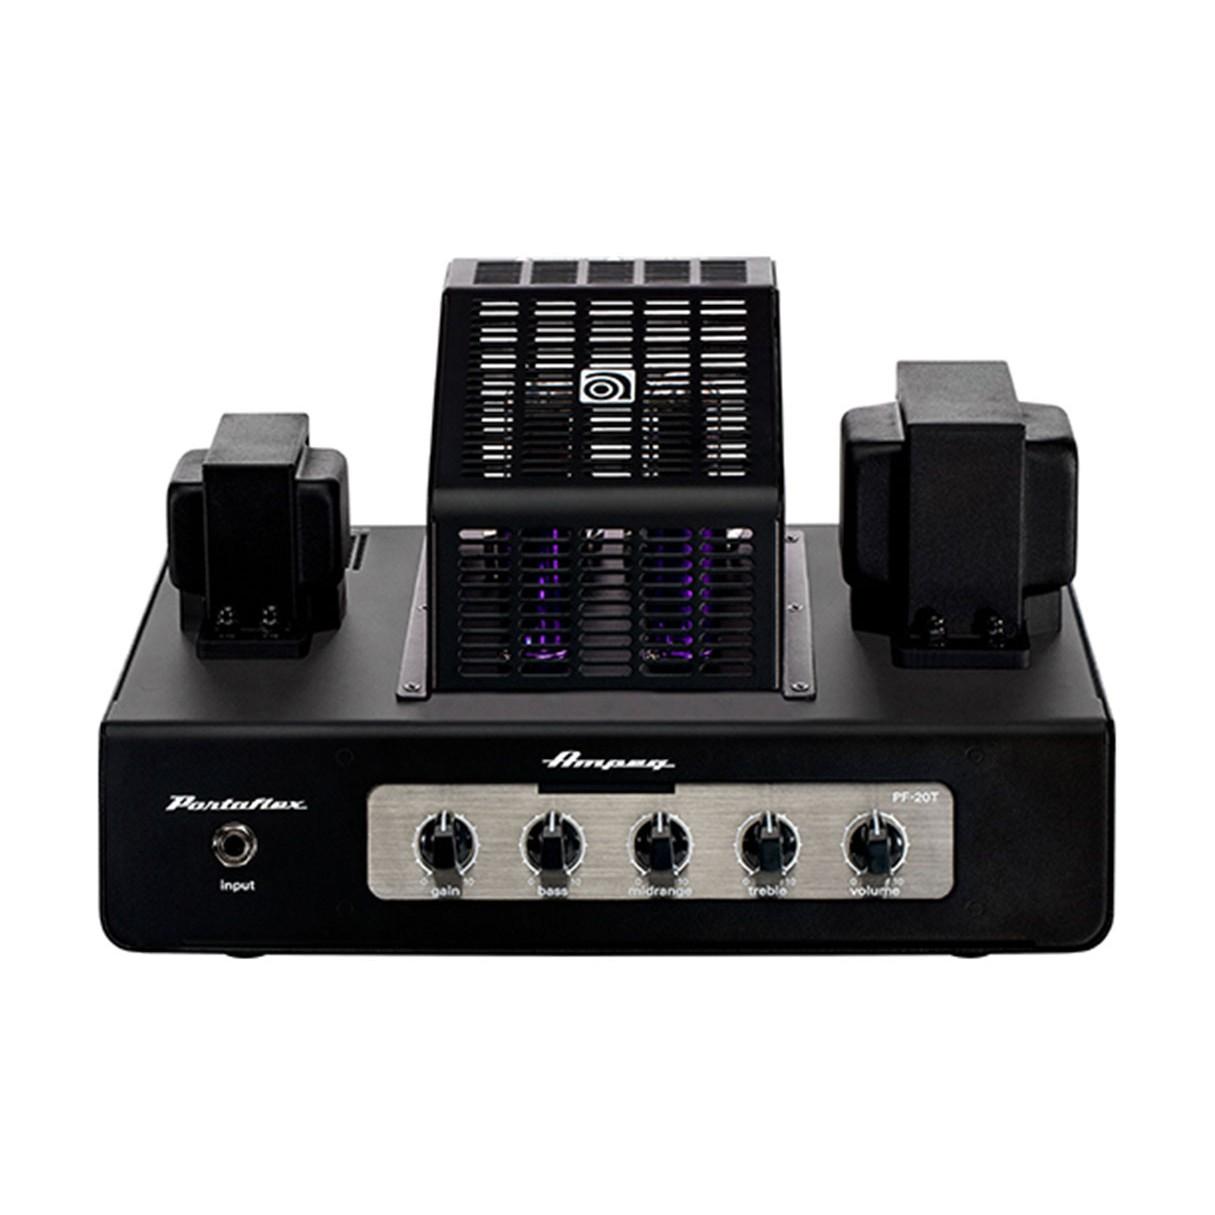 ampeg pf 20t portaflex 20w tube bass amp head